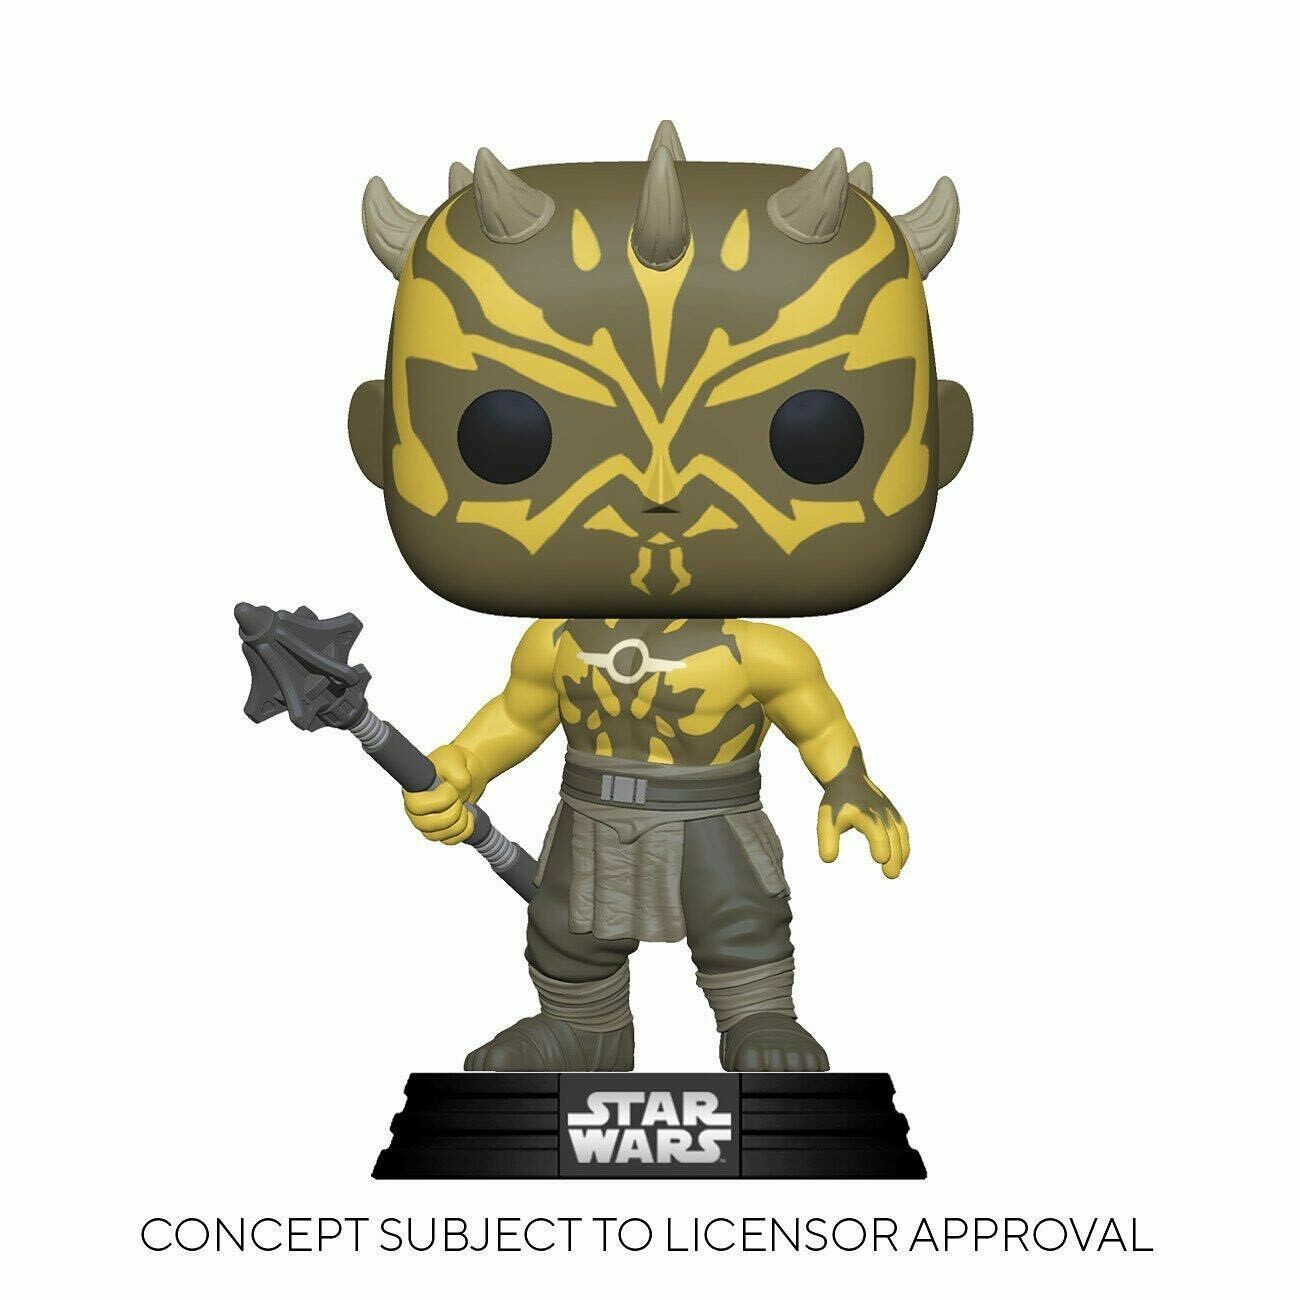 PRE-ORDER Funko Star Wars Jedi: Fallen Order Nightbrother Funko POP! Gamestop Exclusive